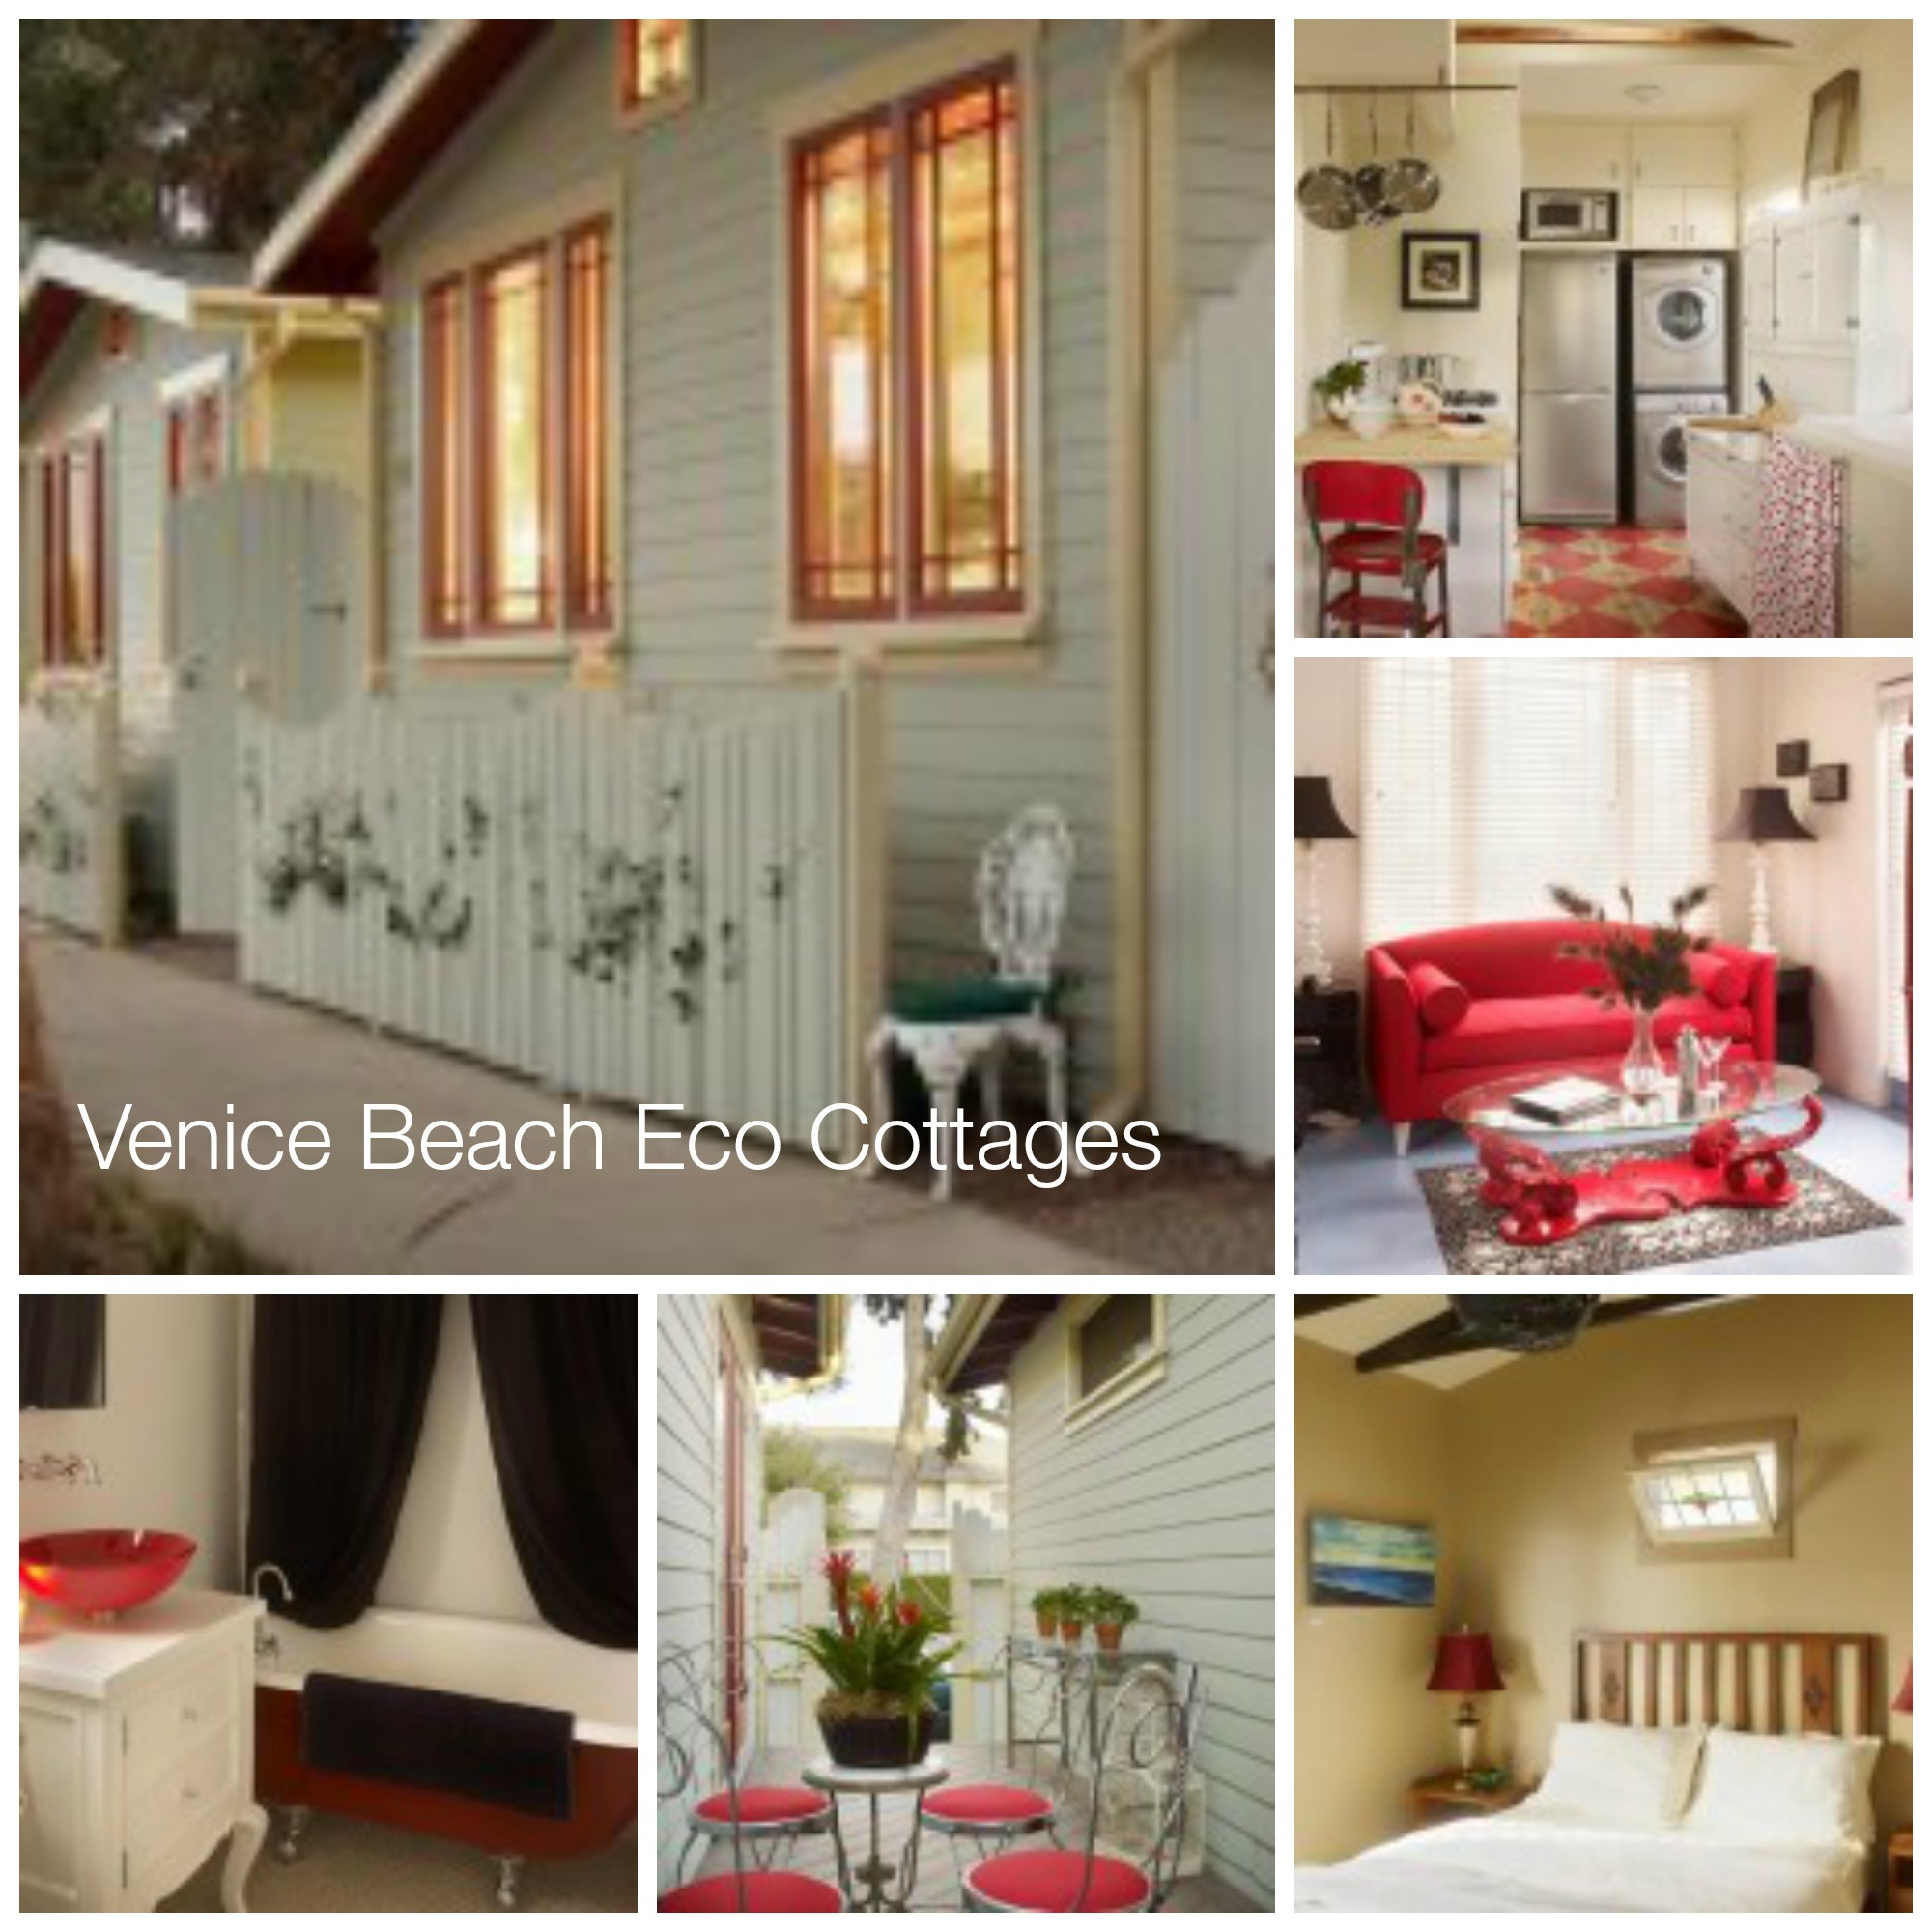 Venice Beach Eco Cottages California Los Angelas Honeymoon Destinations